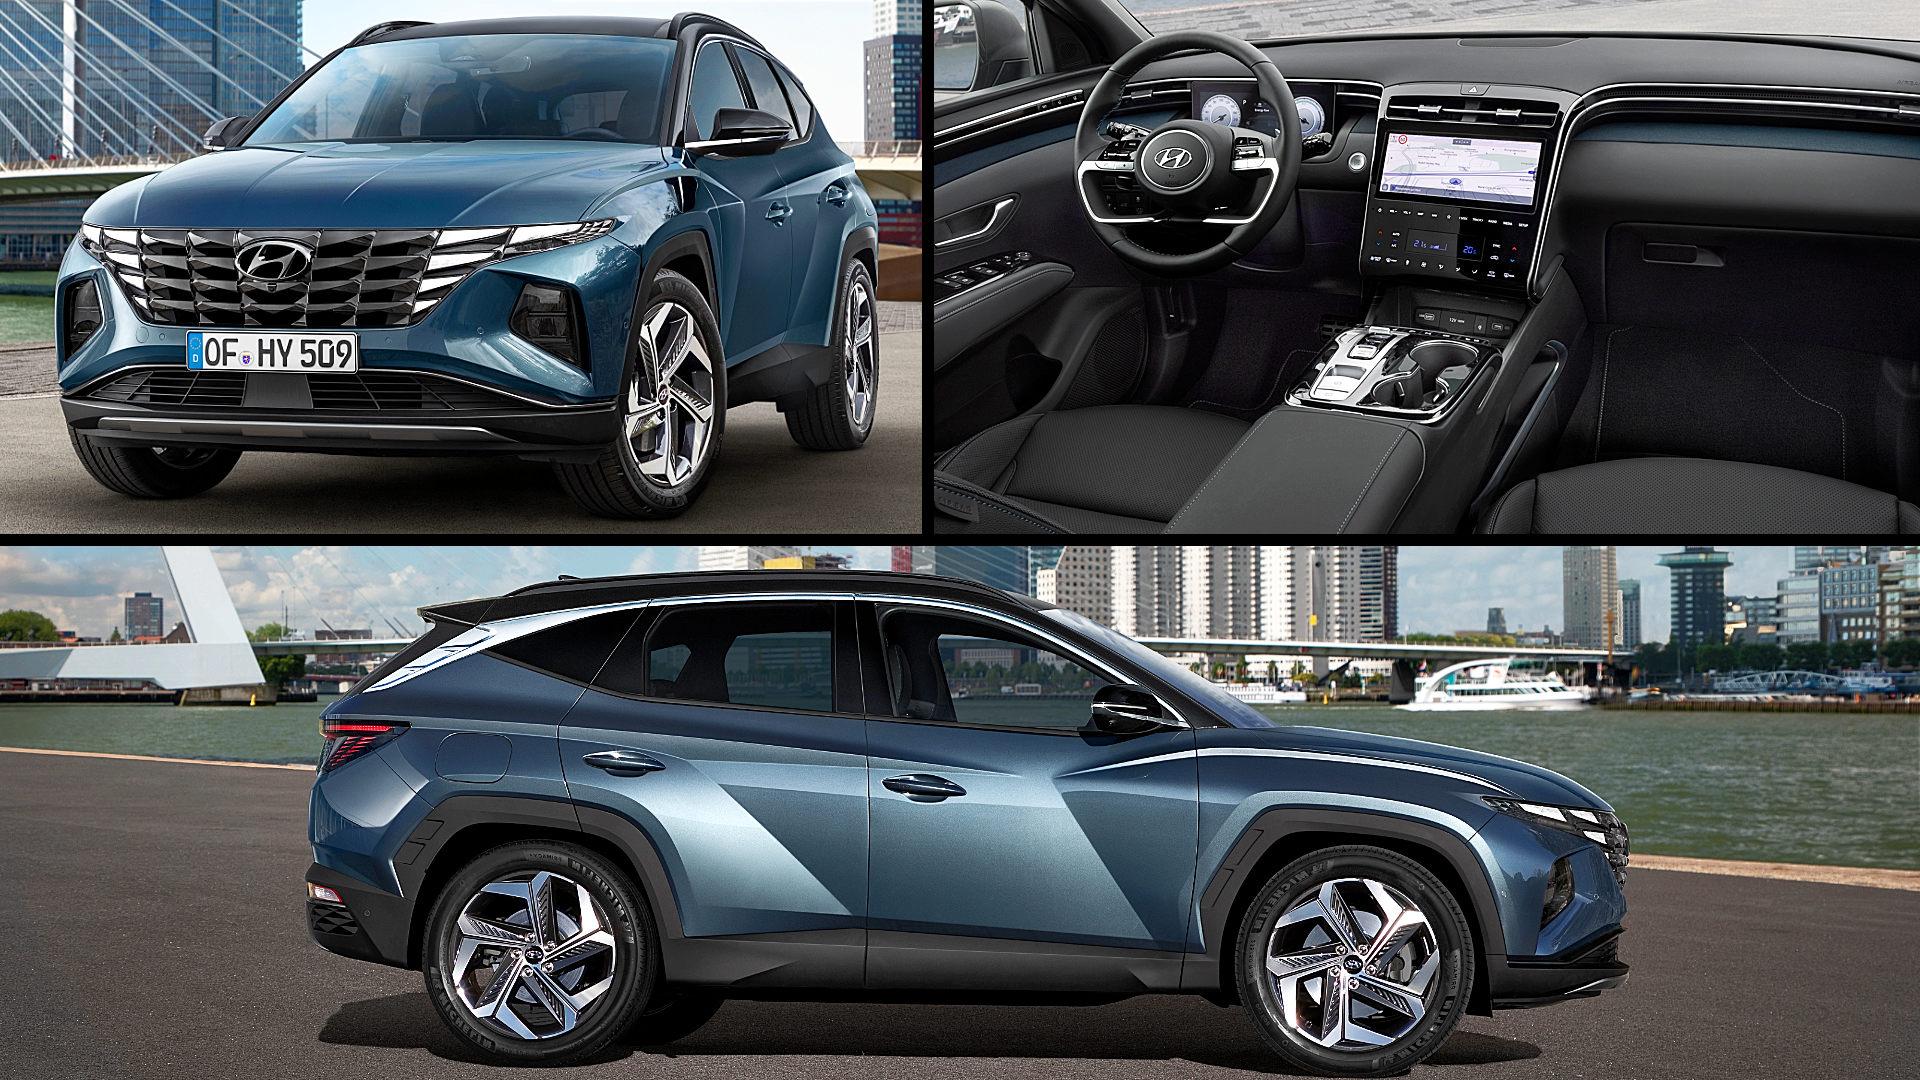 2021 Hyundai Tucson Hybrid Pictures